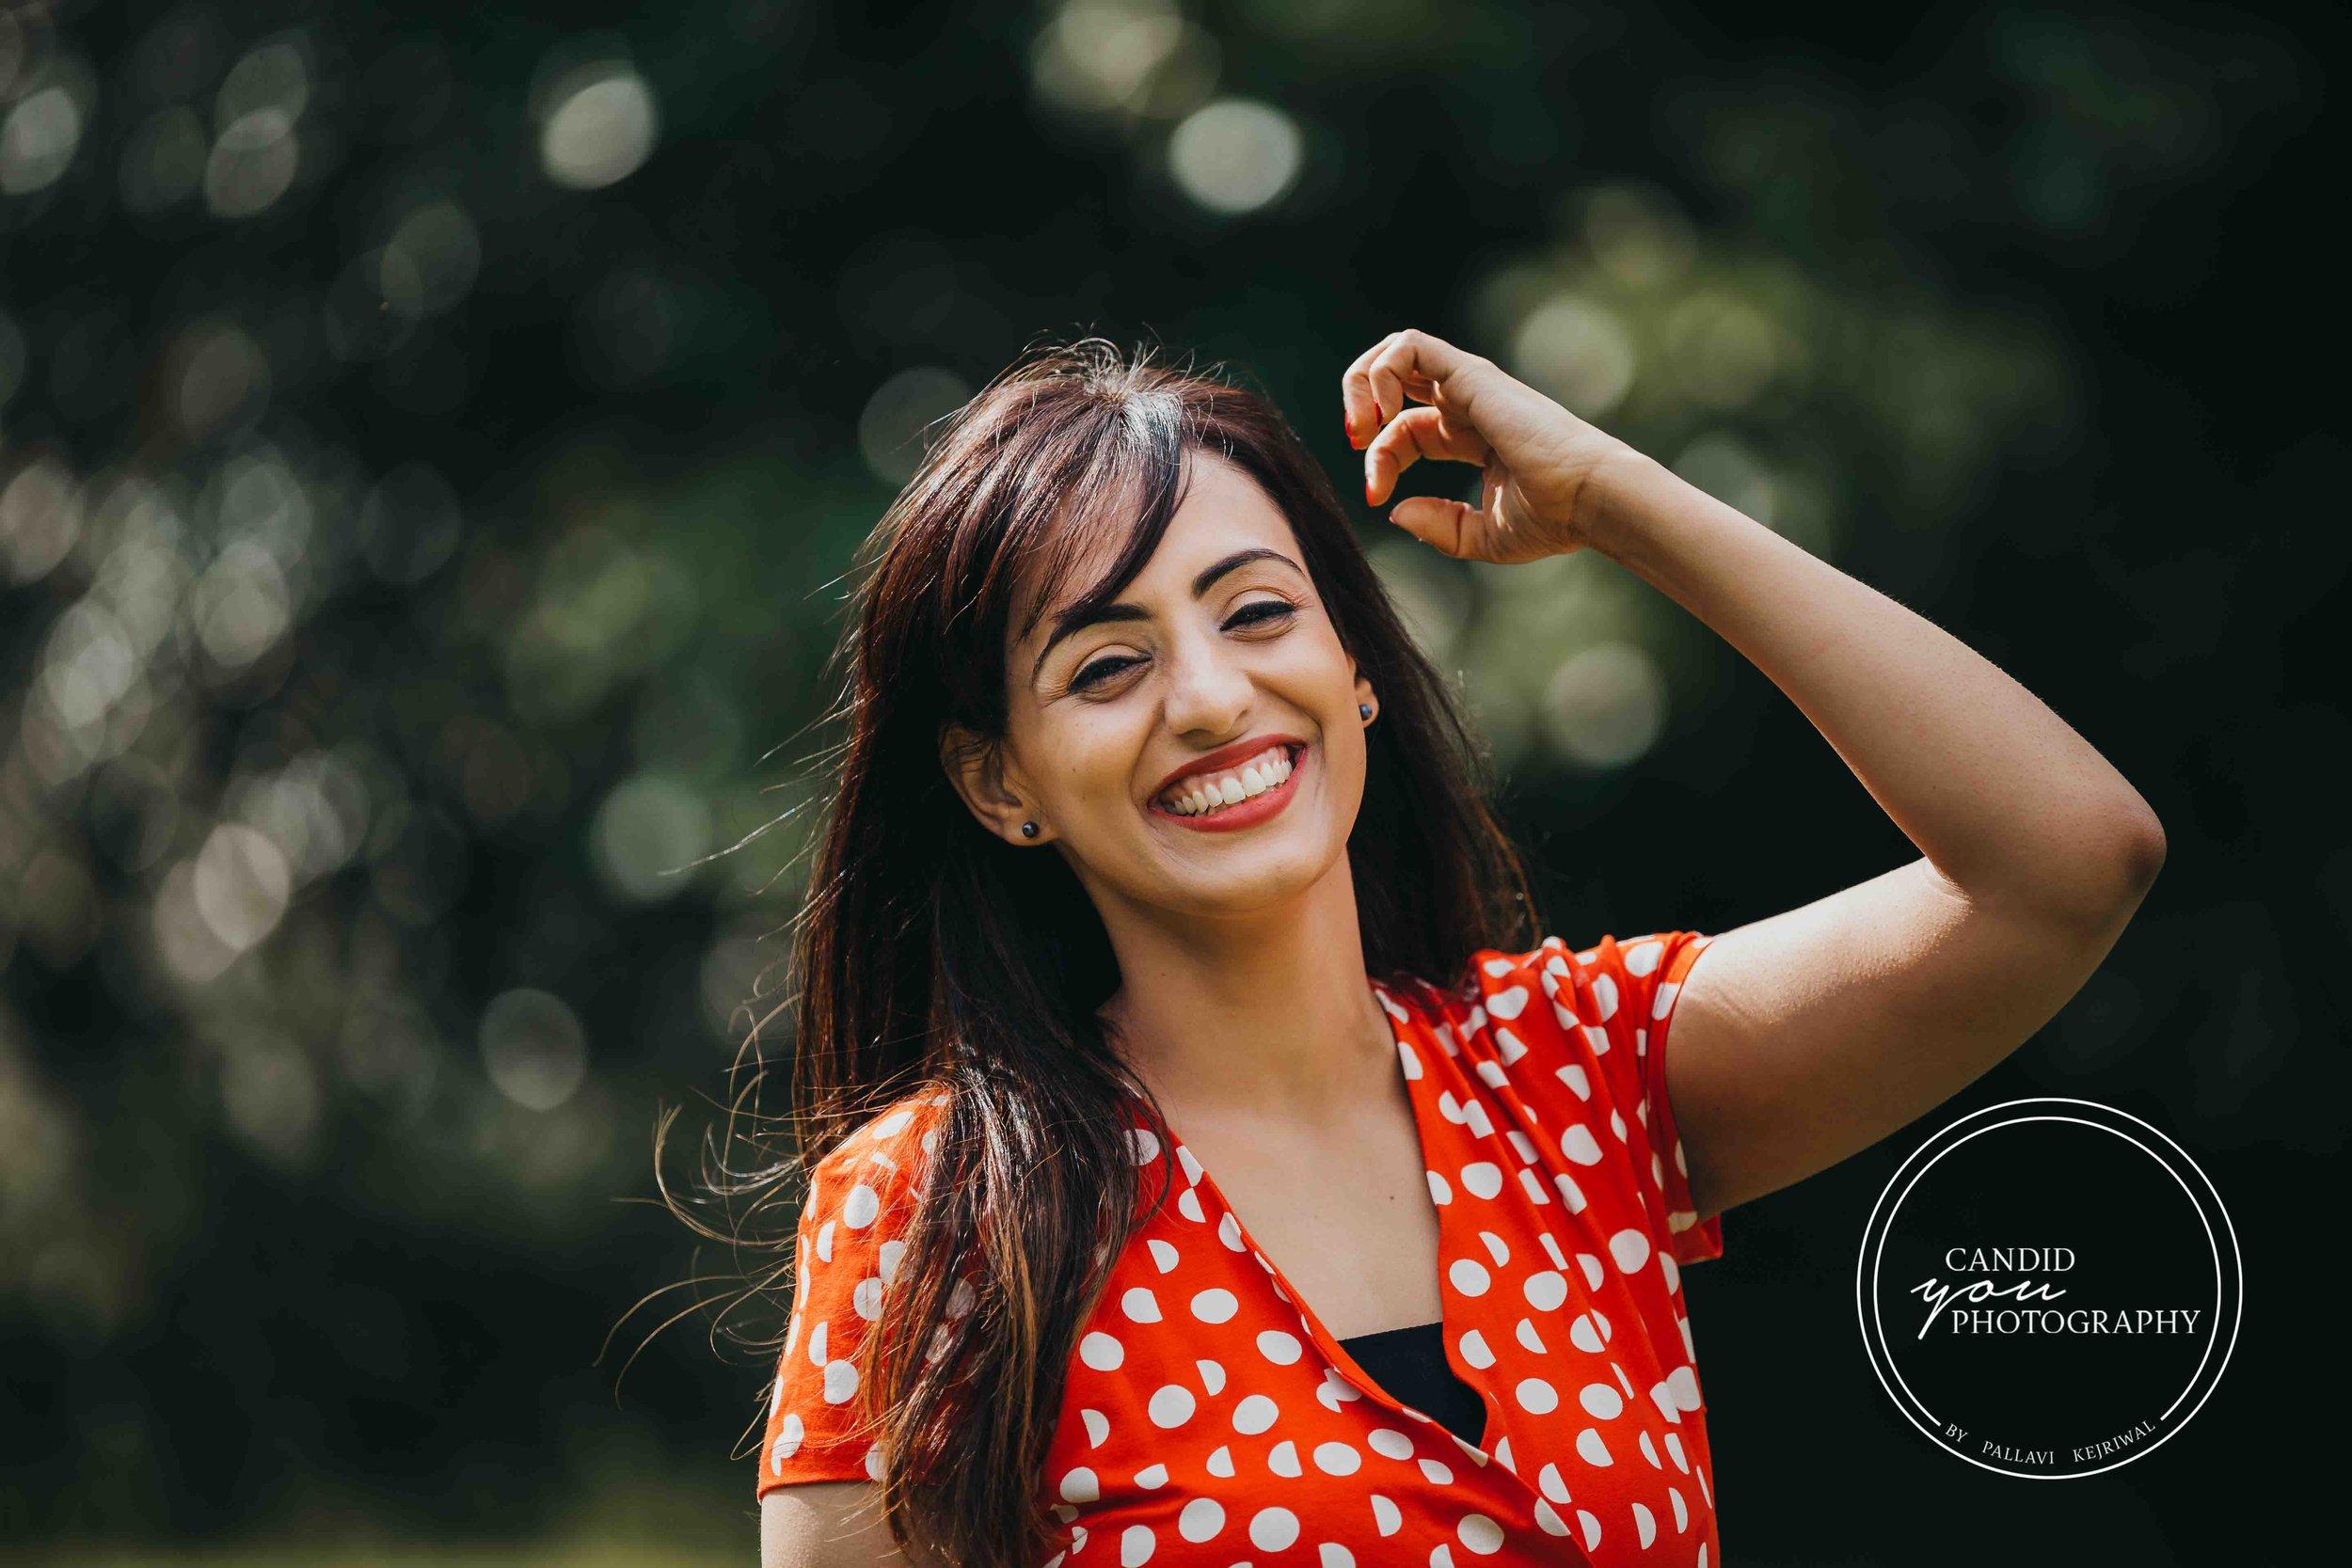 beautiful lady in orange polka dot dress flinging hair and smiling